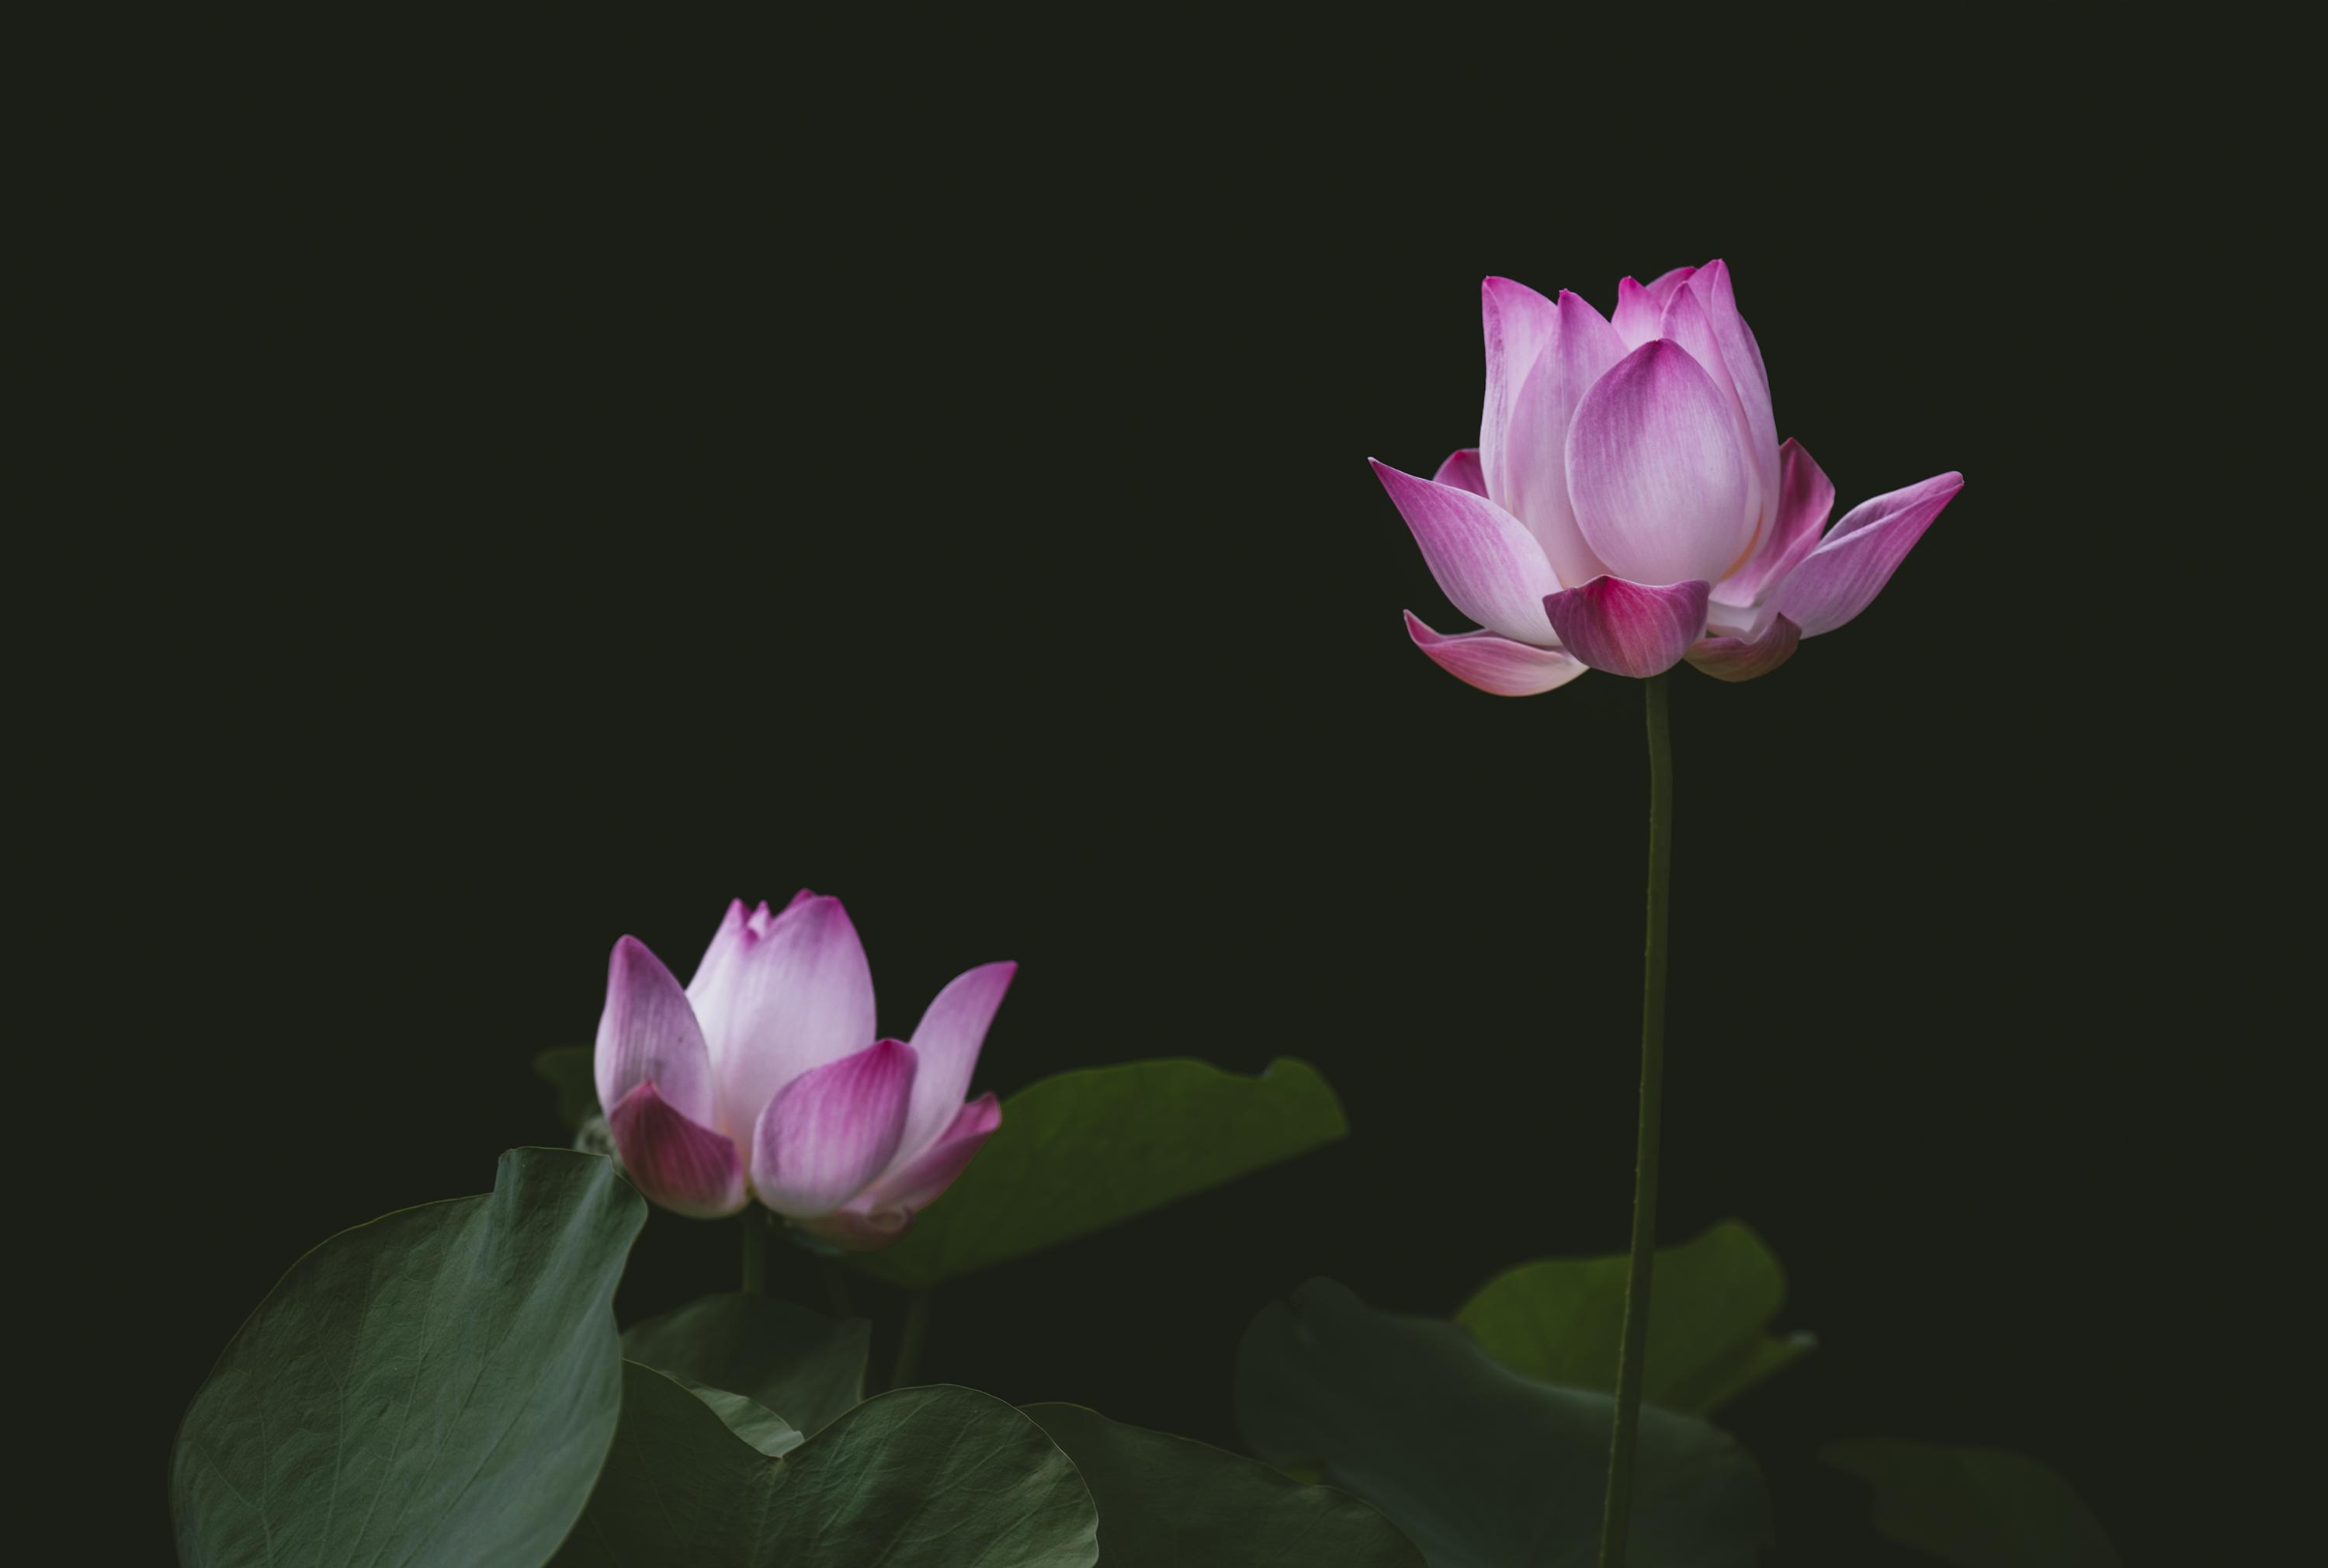 Hong Kong Wallpaper Iphone X Free Stock Photo Of Aquatic Bloom Blooming